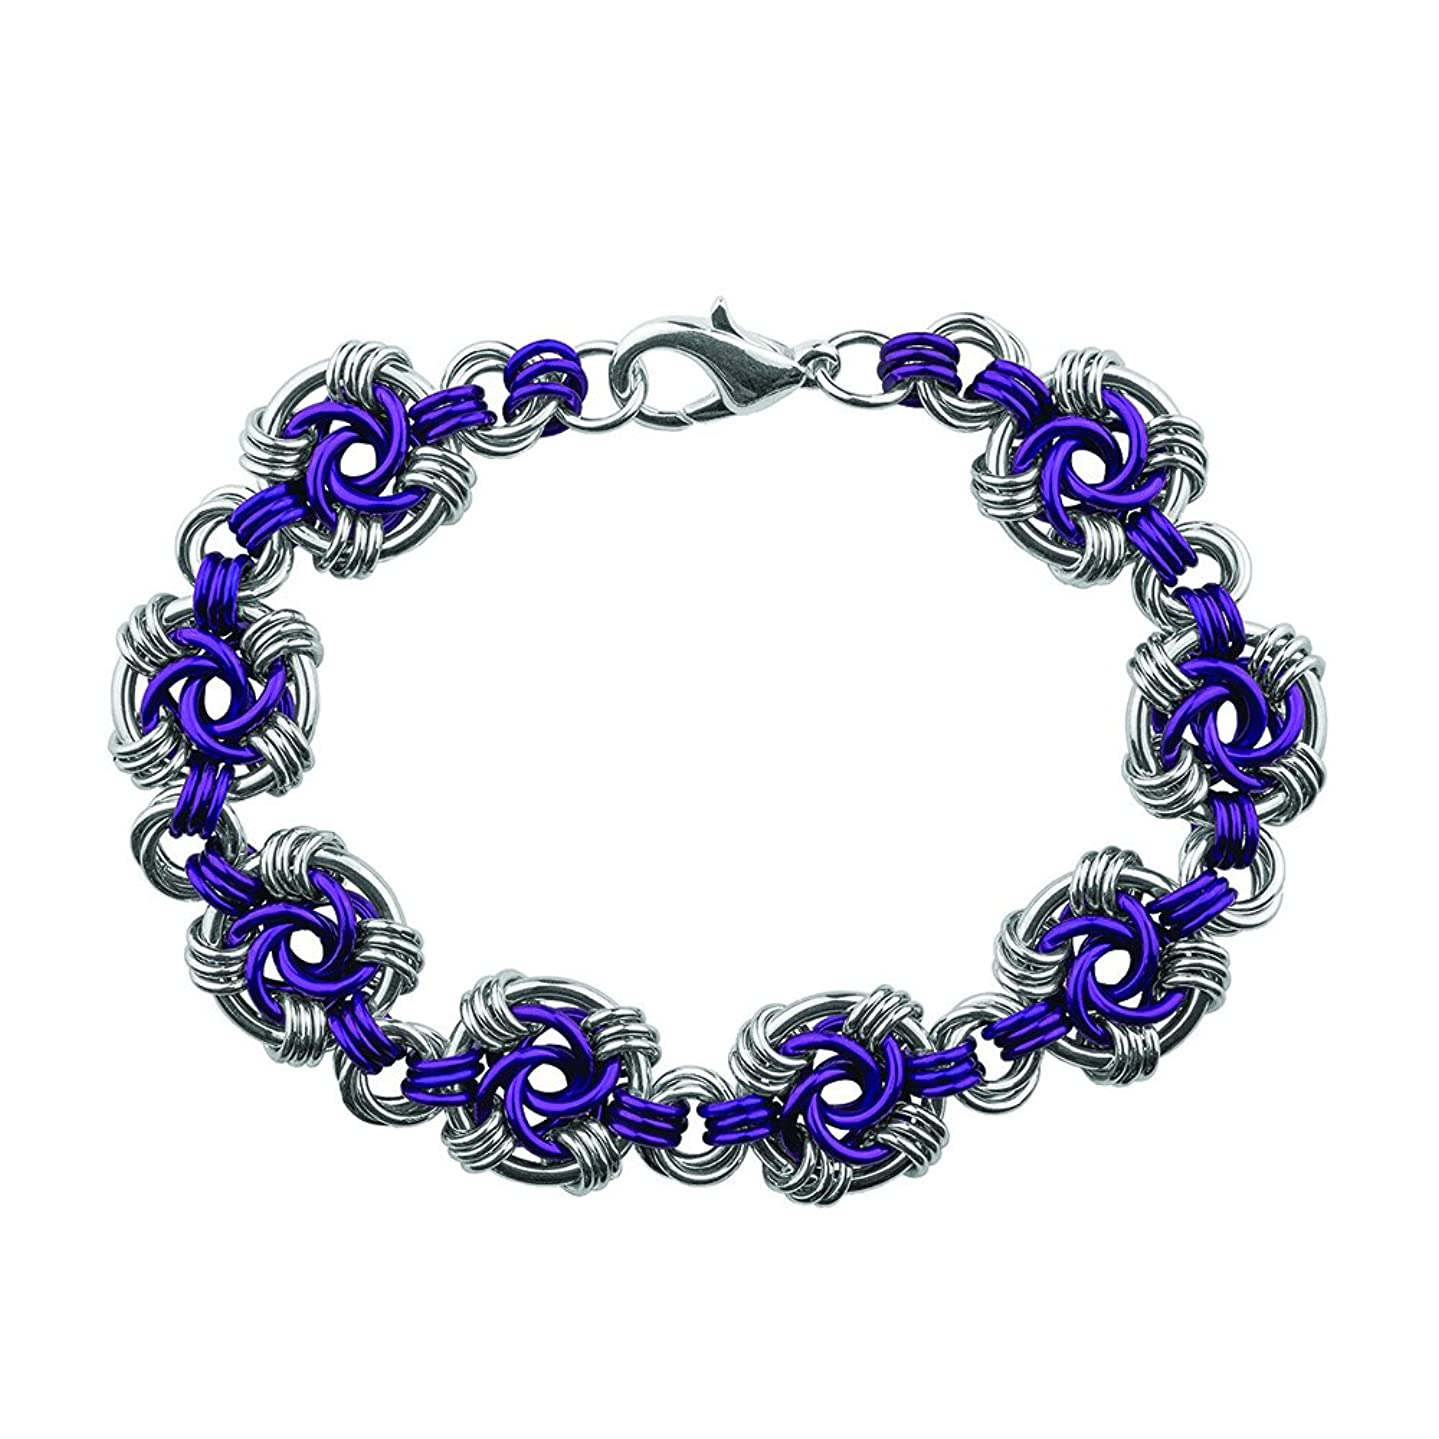 Weave Got Maille Lilac Swirls Chain Maille Bracelet Kit